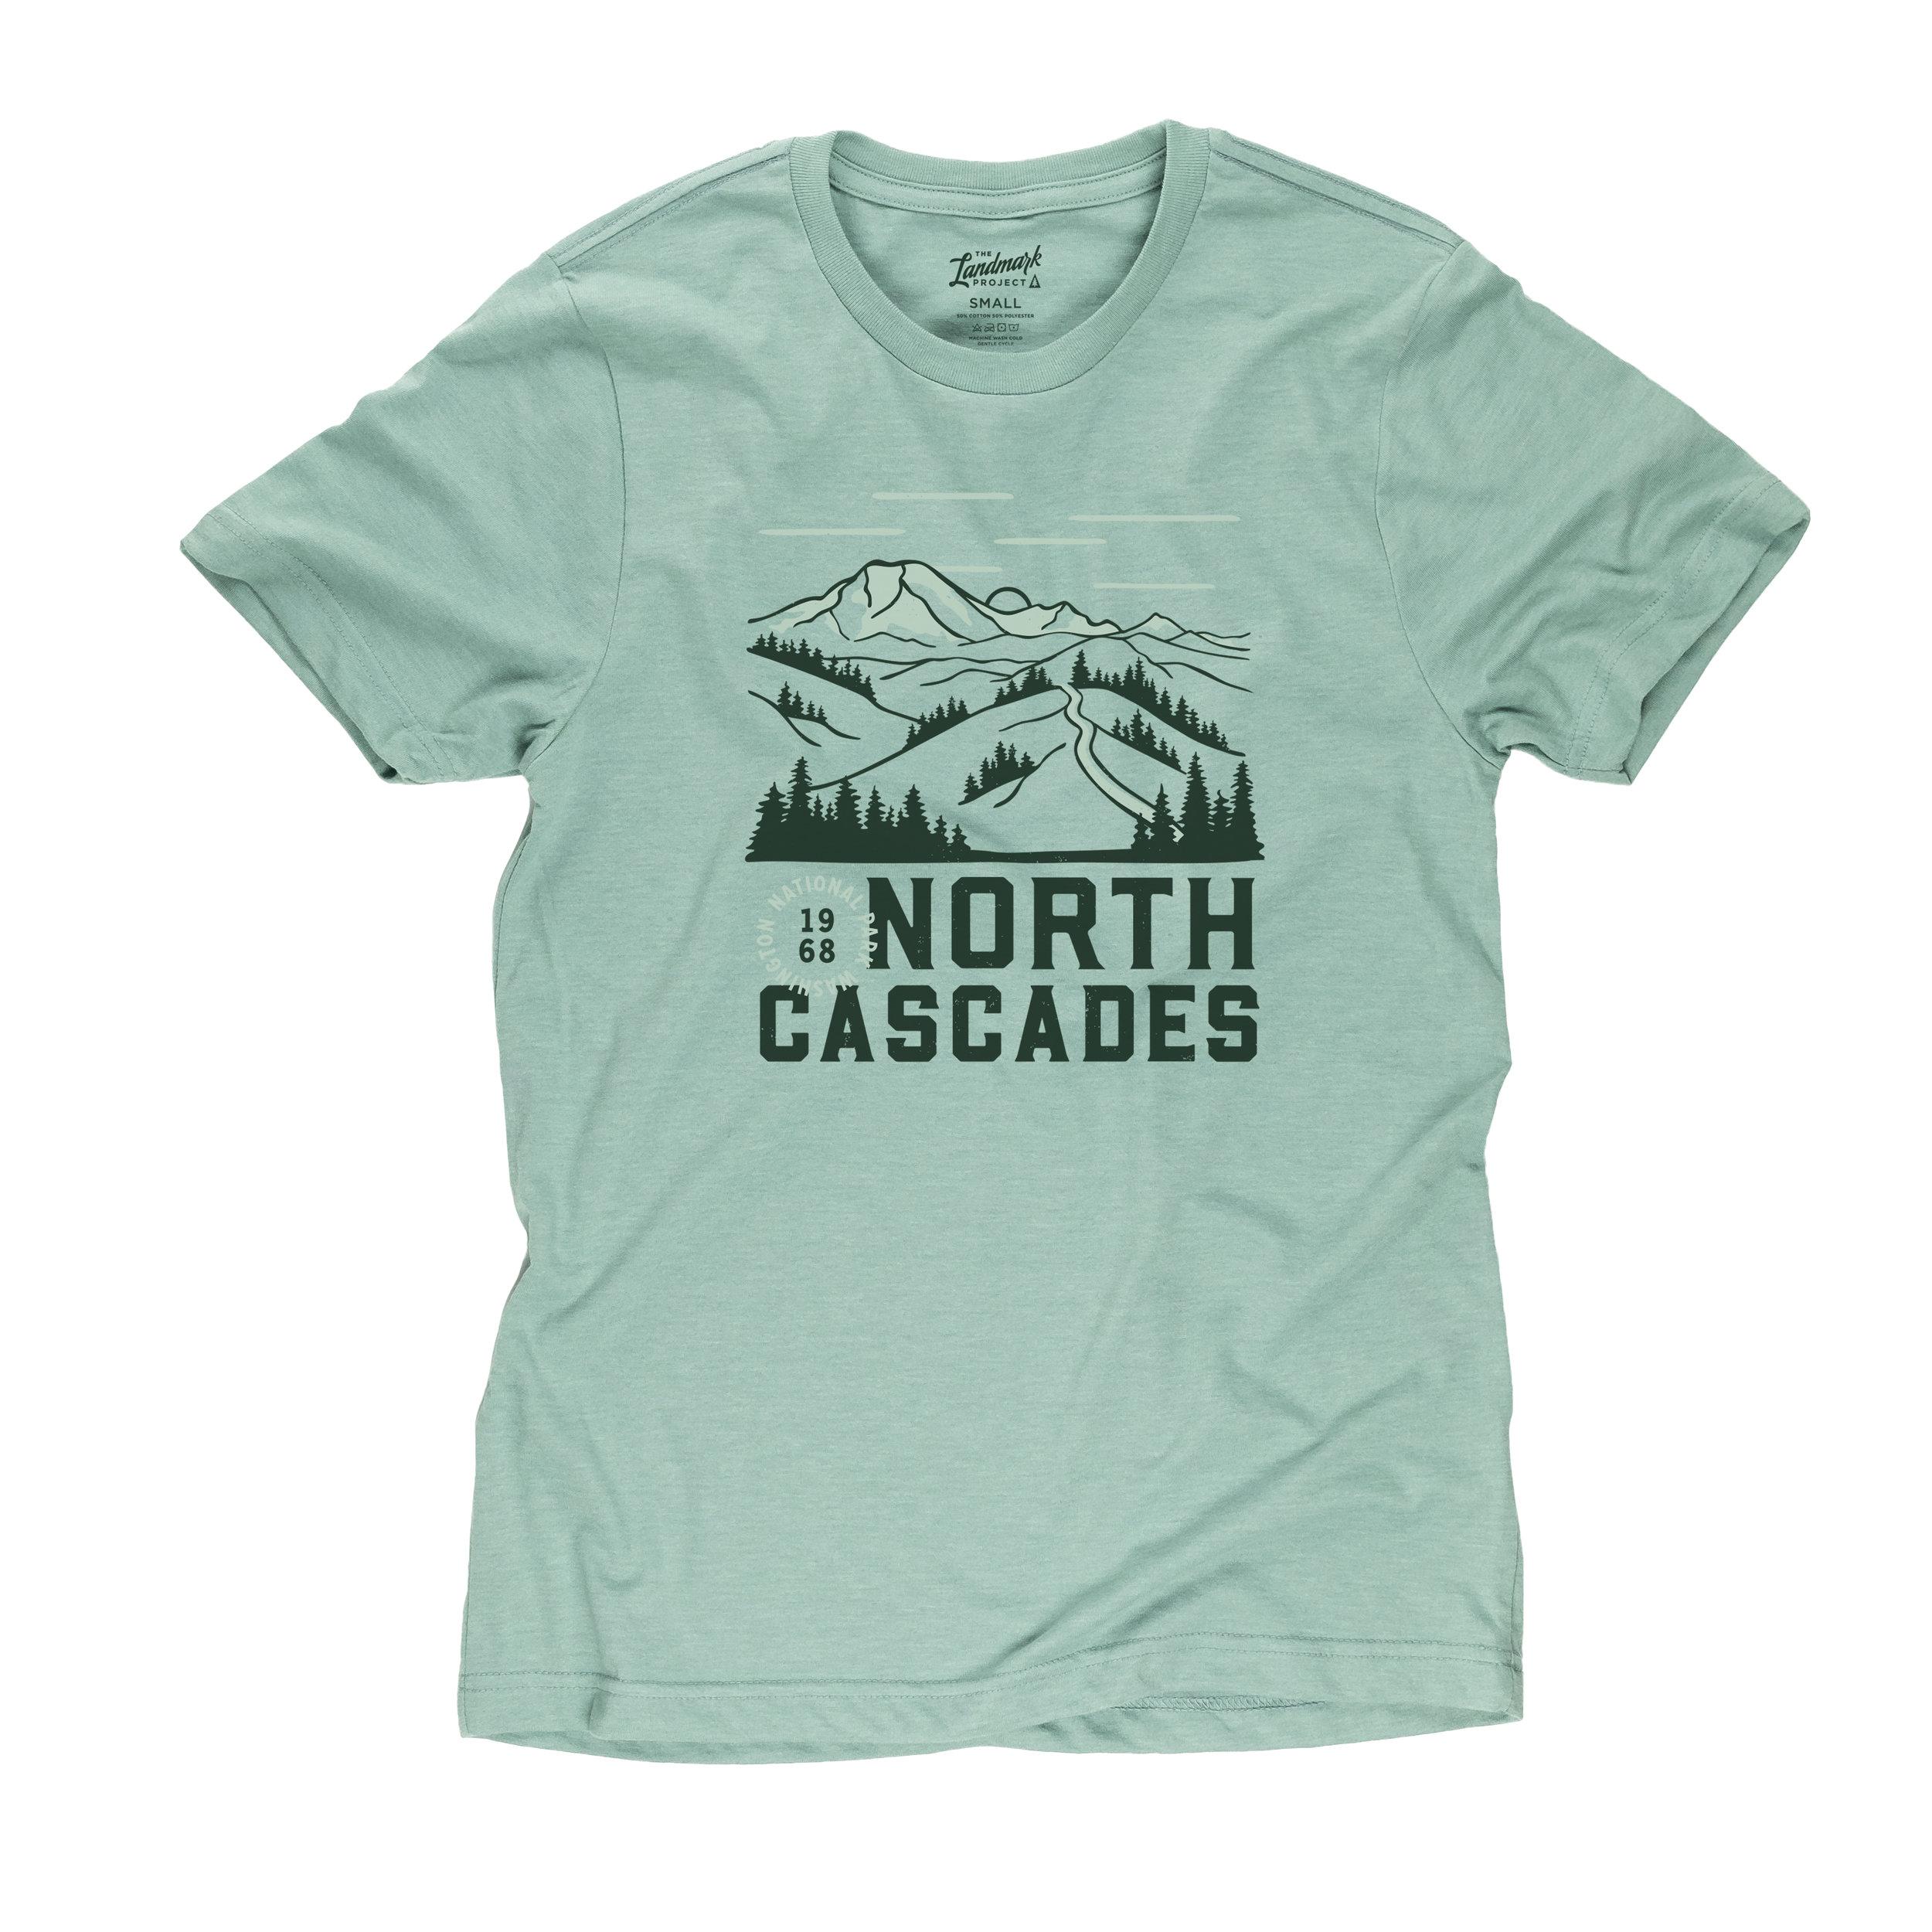 north-cascades-motif-seafoam-tee.jpg